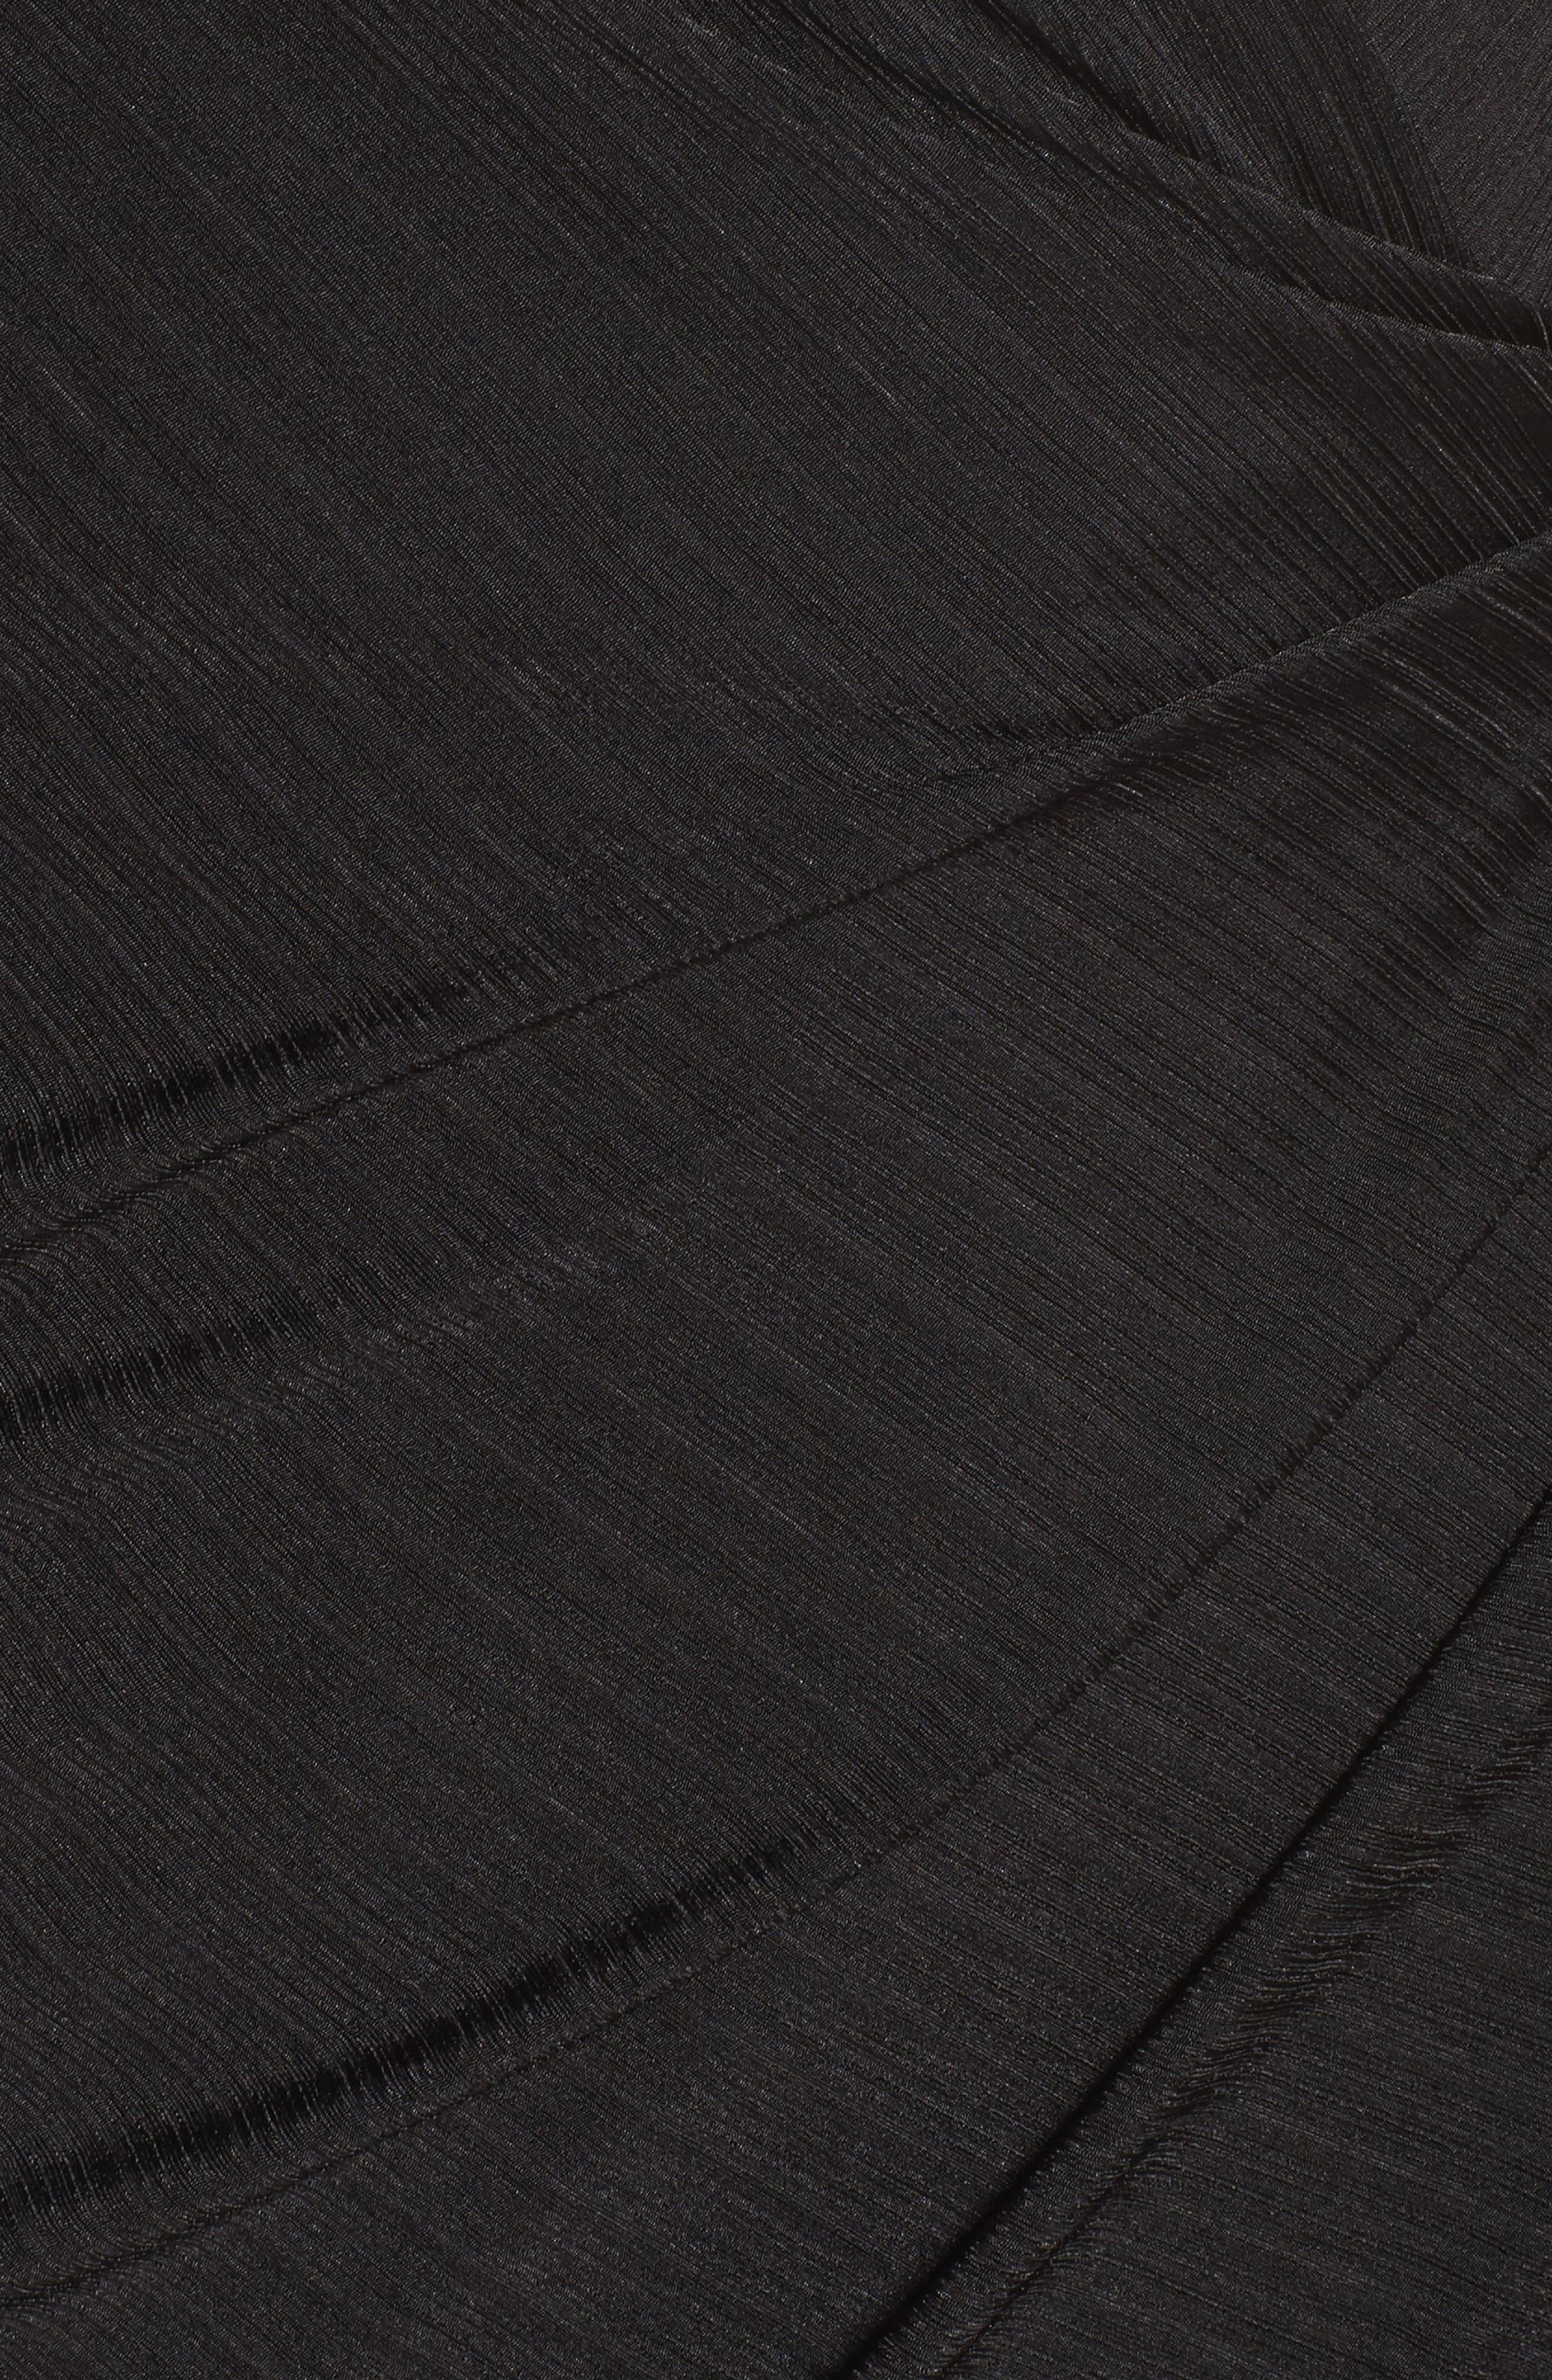 Choker Neck Asymmetric Dress,                             Alternate thumbnail 5, color,                             001